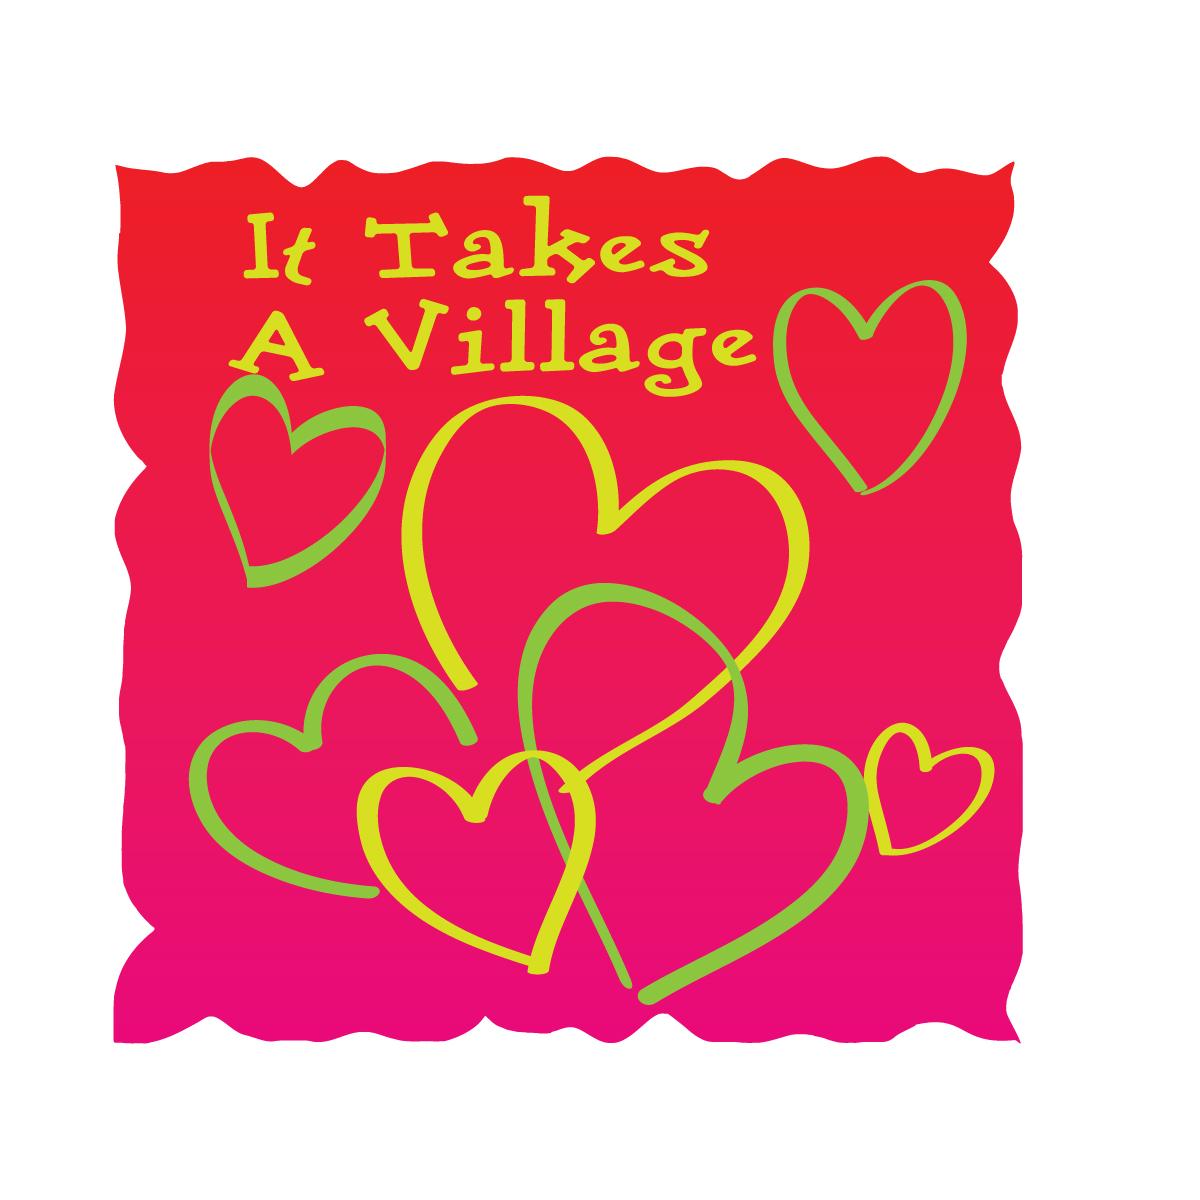 Logo Design by danelav - Entry No. 22 in the Logo Design Contest Captivating Logo Design for It Takes A Village.